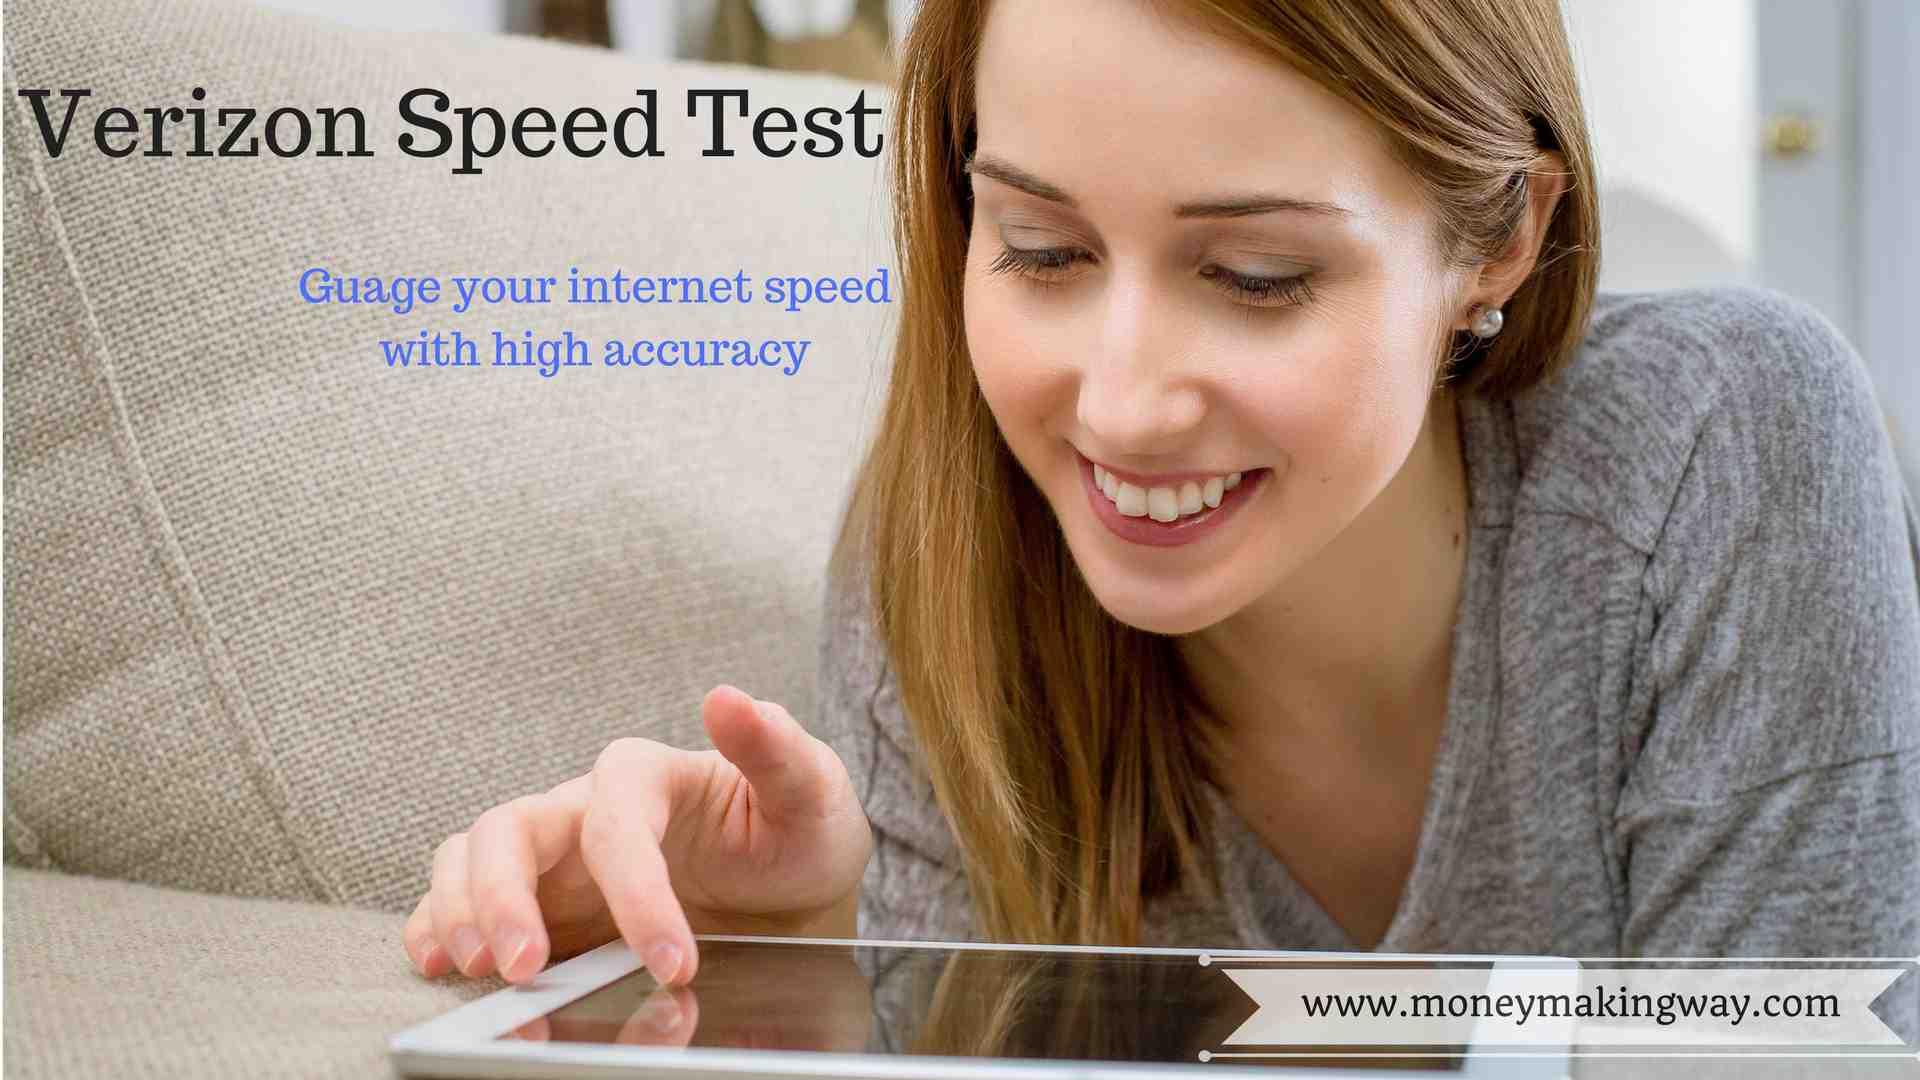 Verizon Speed Test